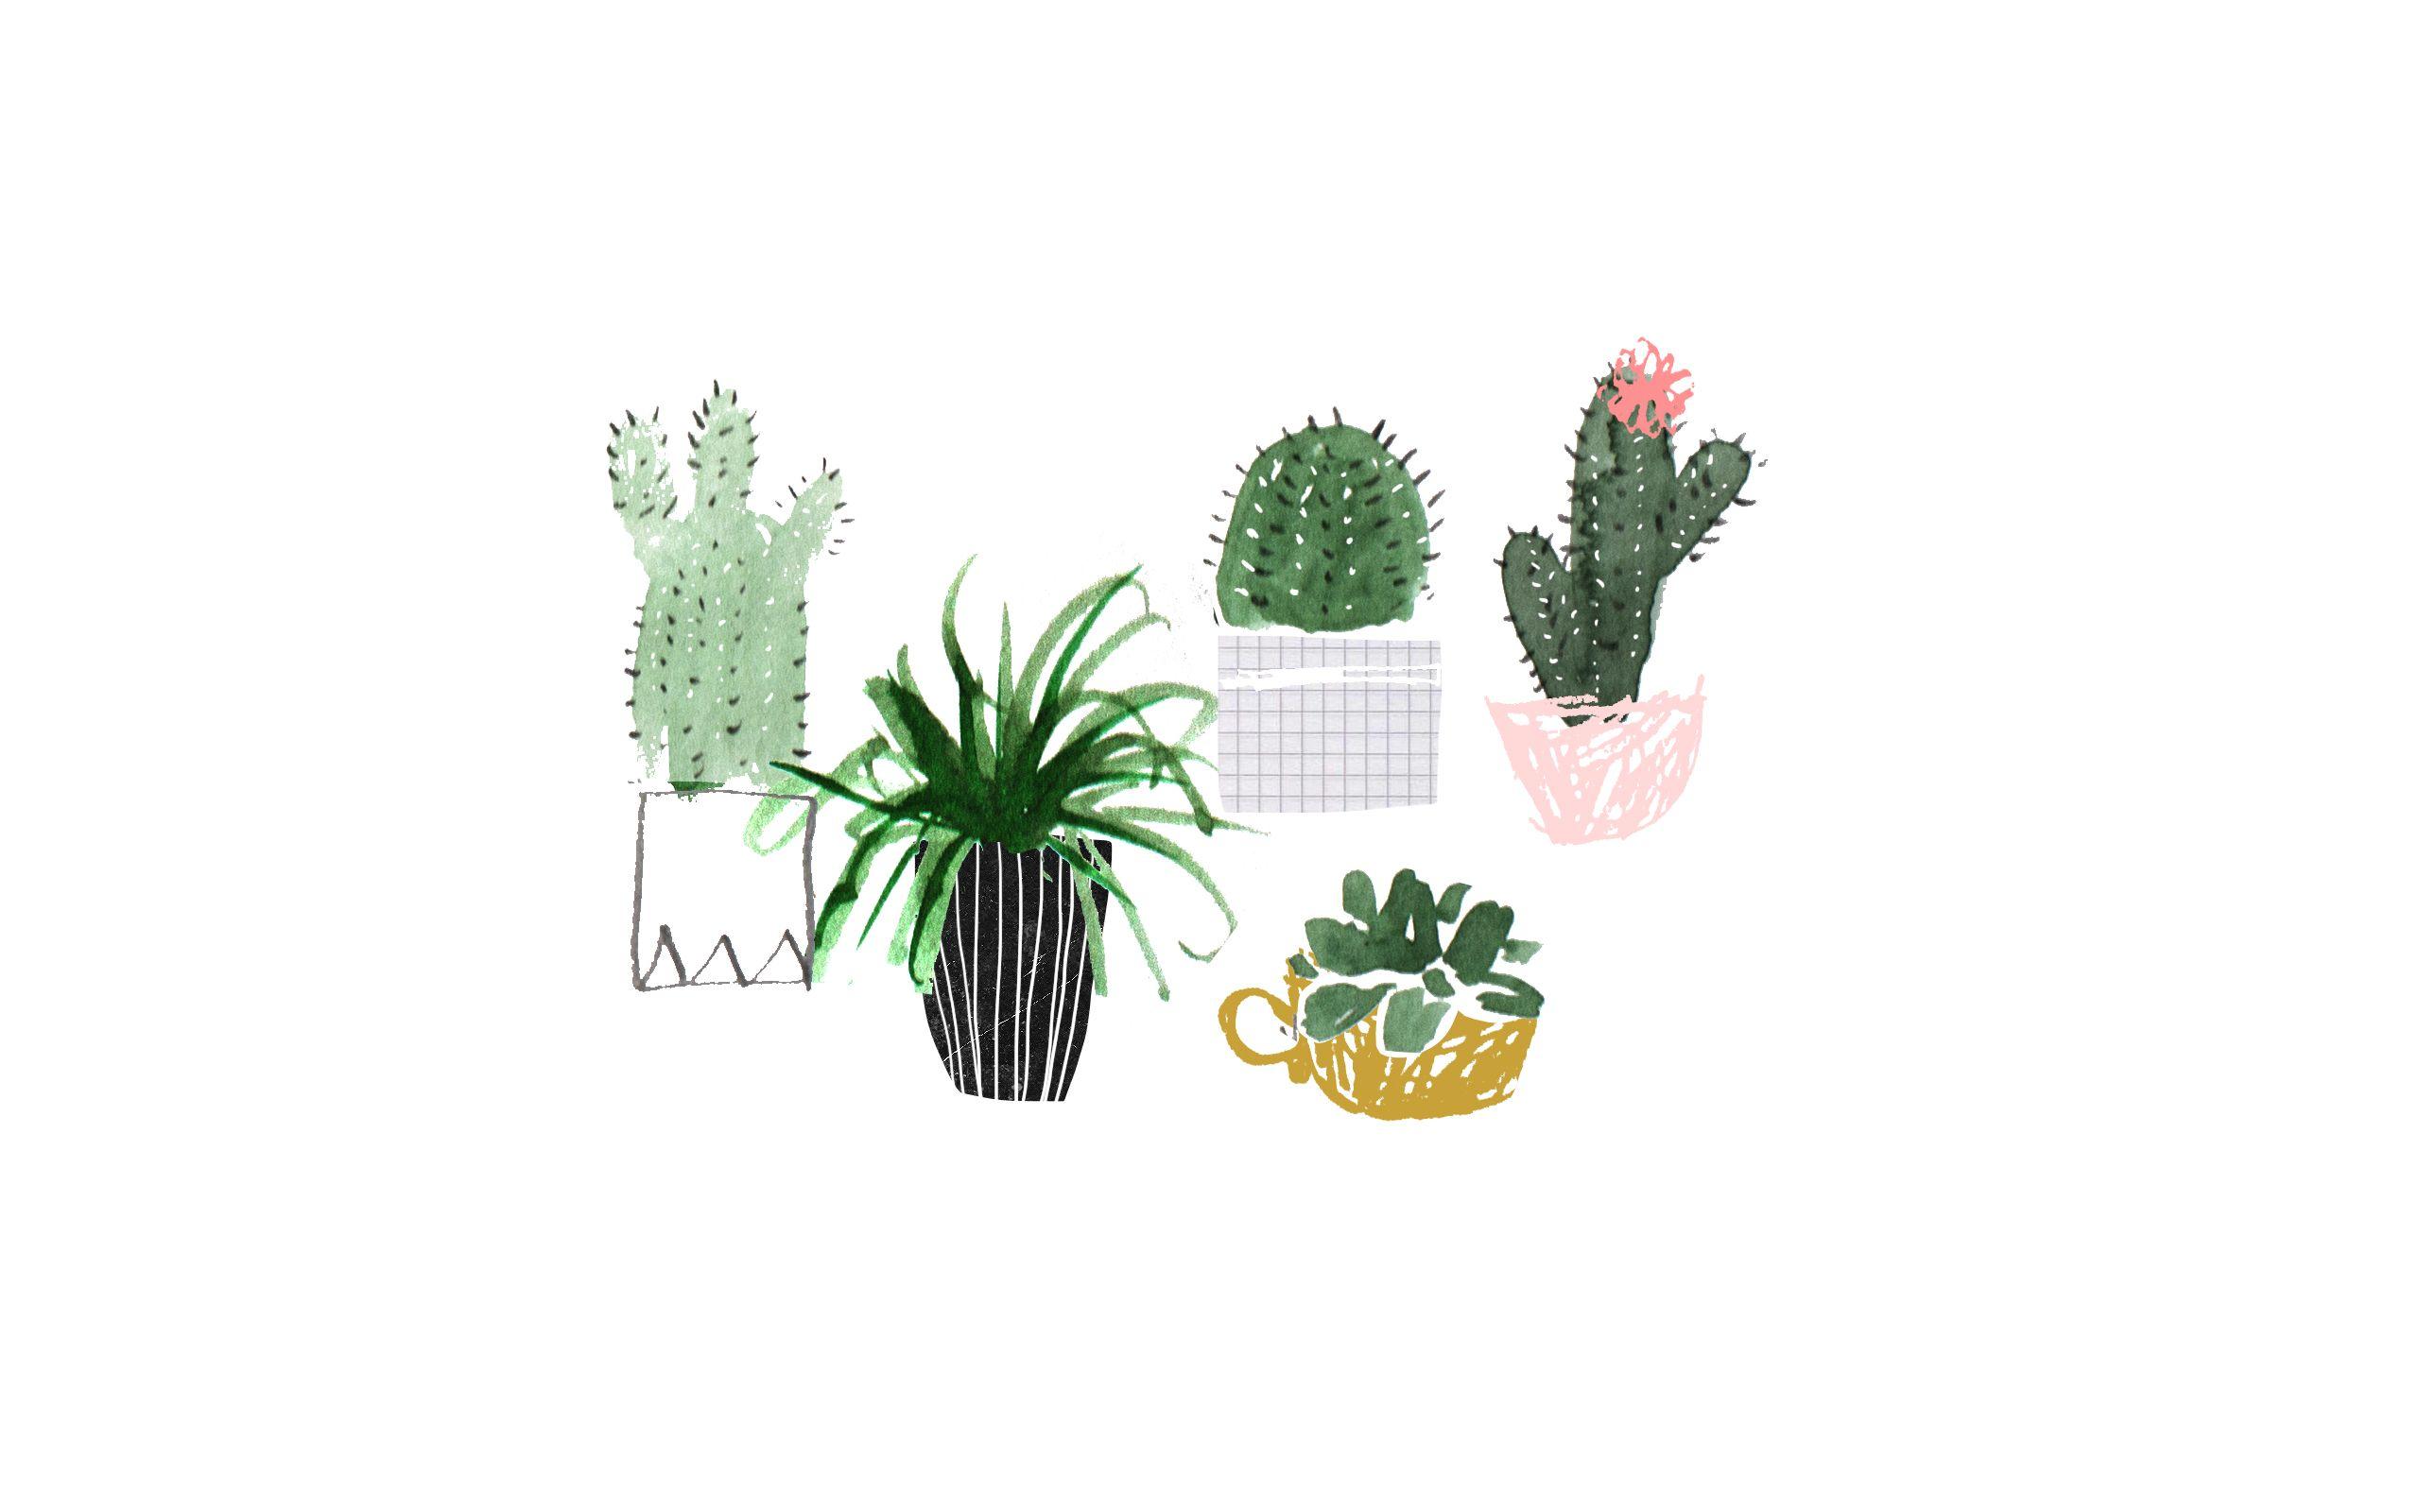 desktop background wallpaper plants